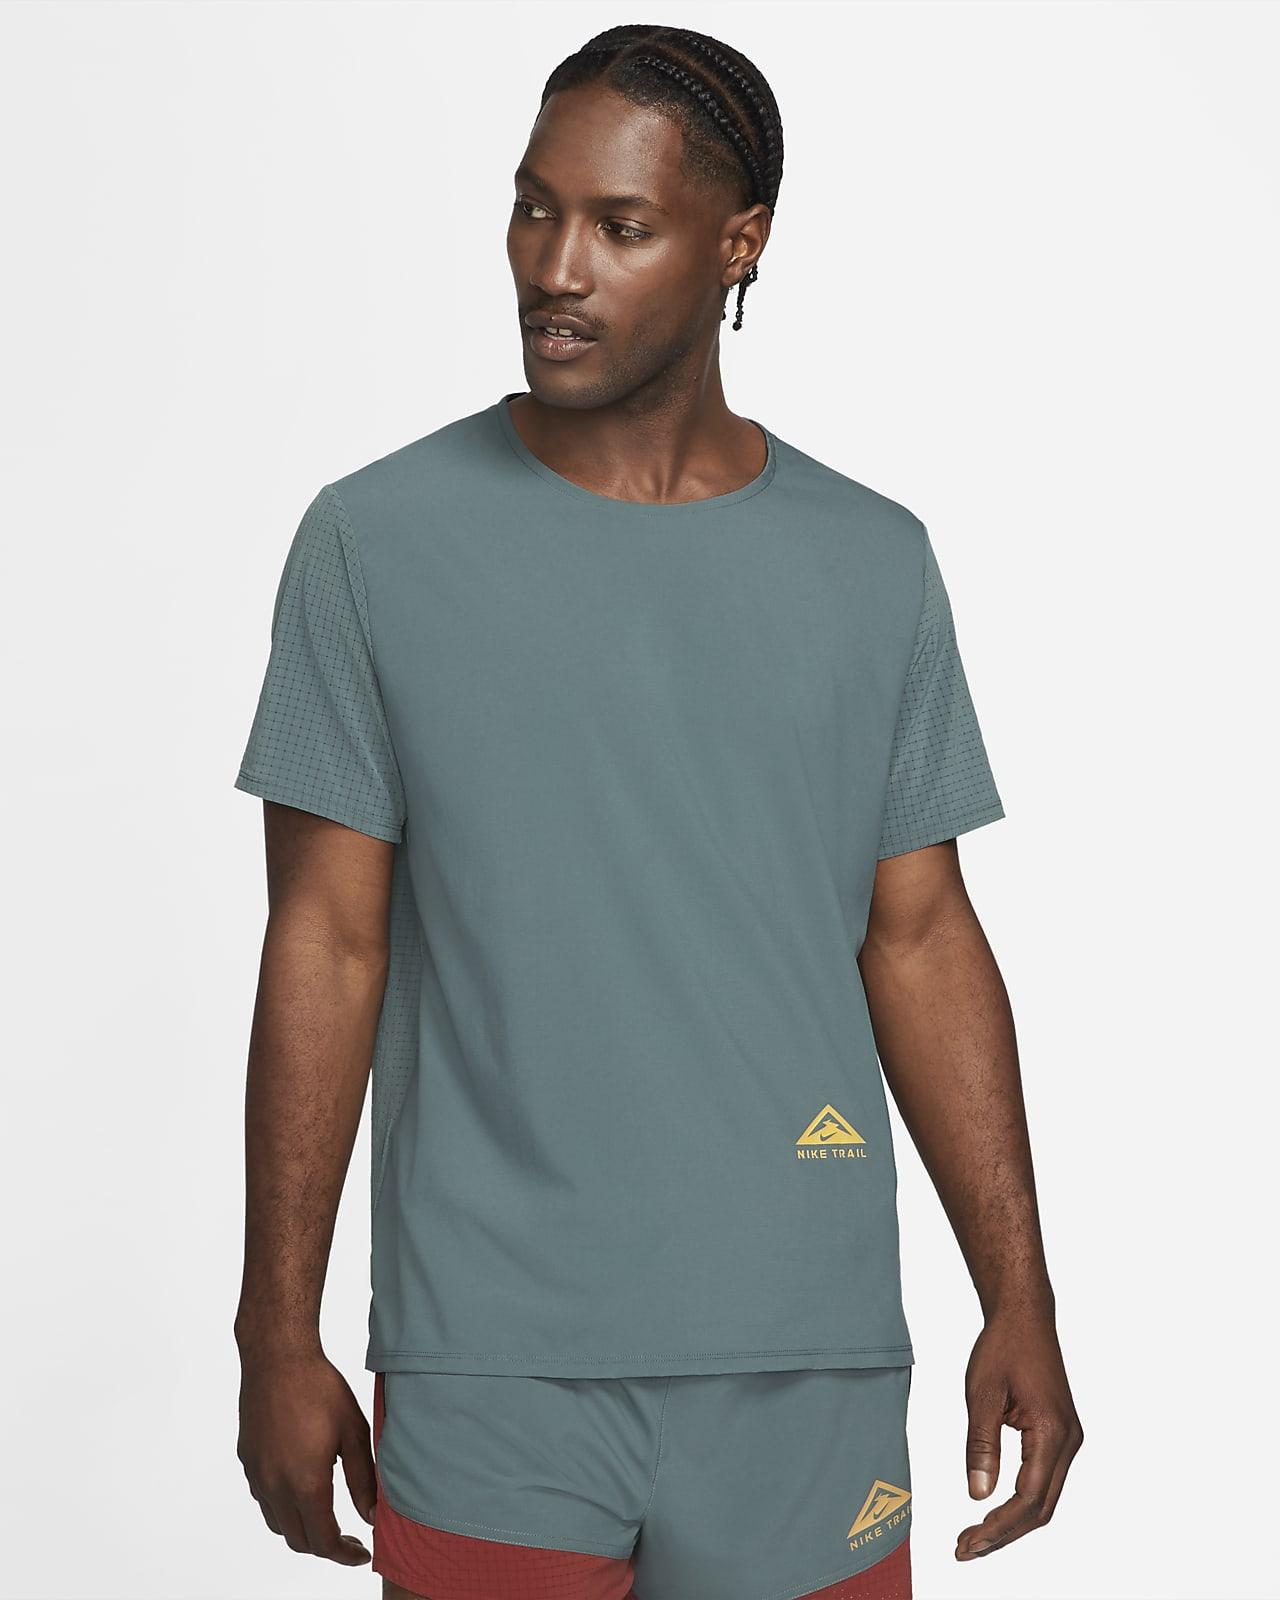 Nike Dri-FIT Rise 365 Short-Sleeve Trail Running Top